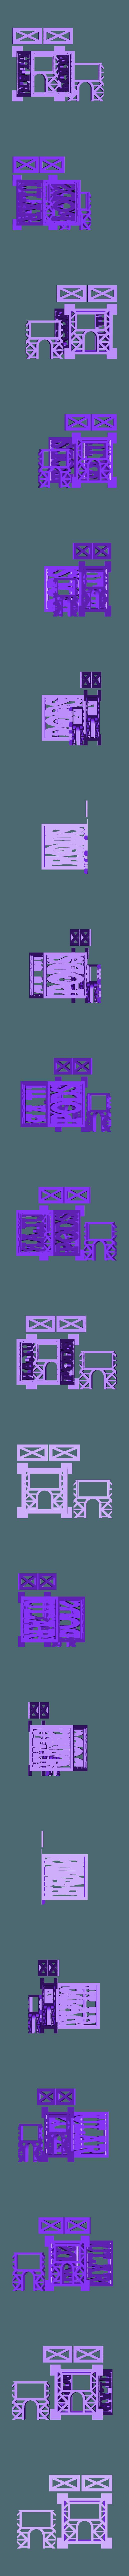 "PoddyAwardSmall.stl Download free STL file Modular Art Pods ""The Poddys"" Award / Trophy #modularartpods • Design to 3D print, tonyyoungblood"